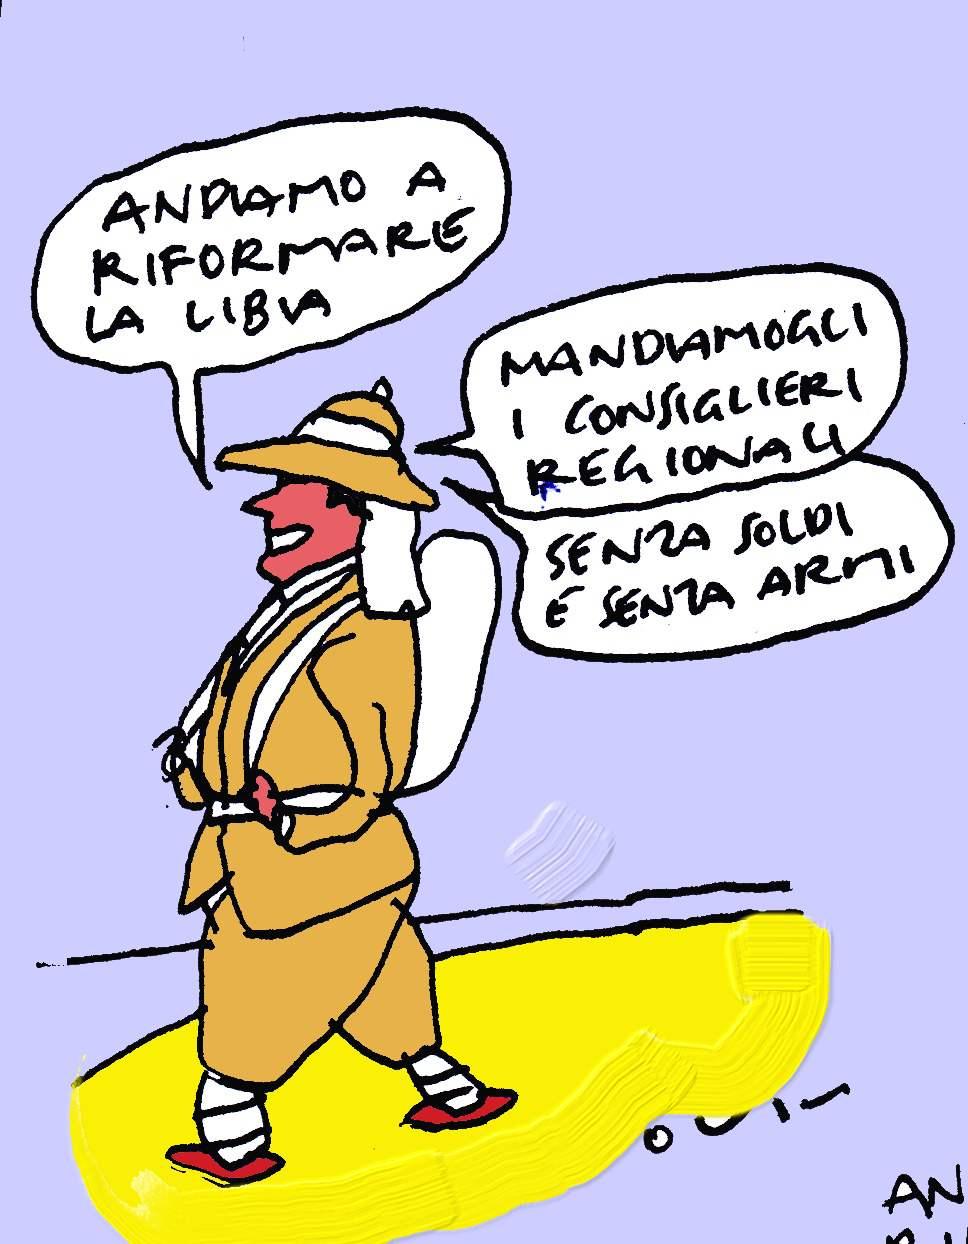 riforma libiak